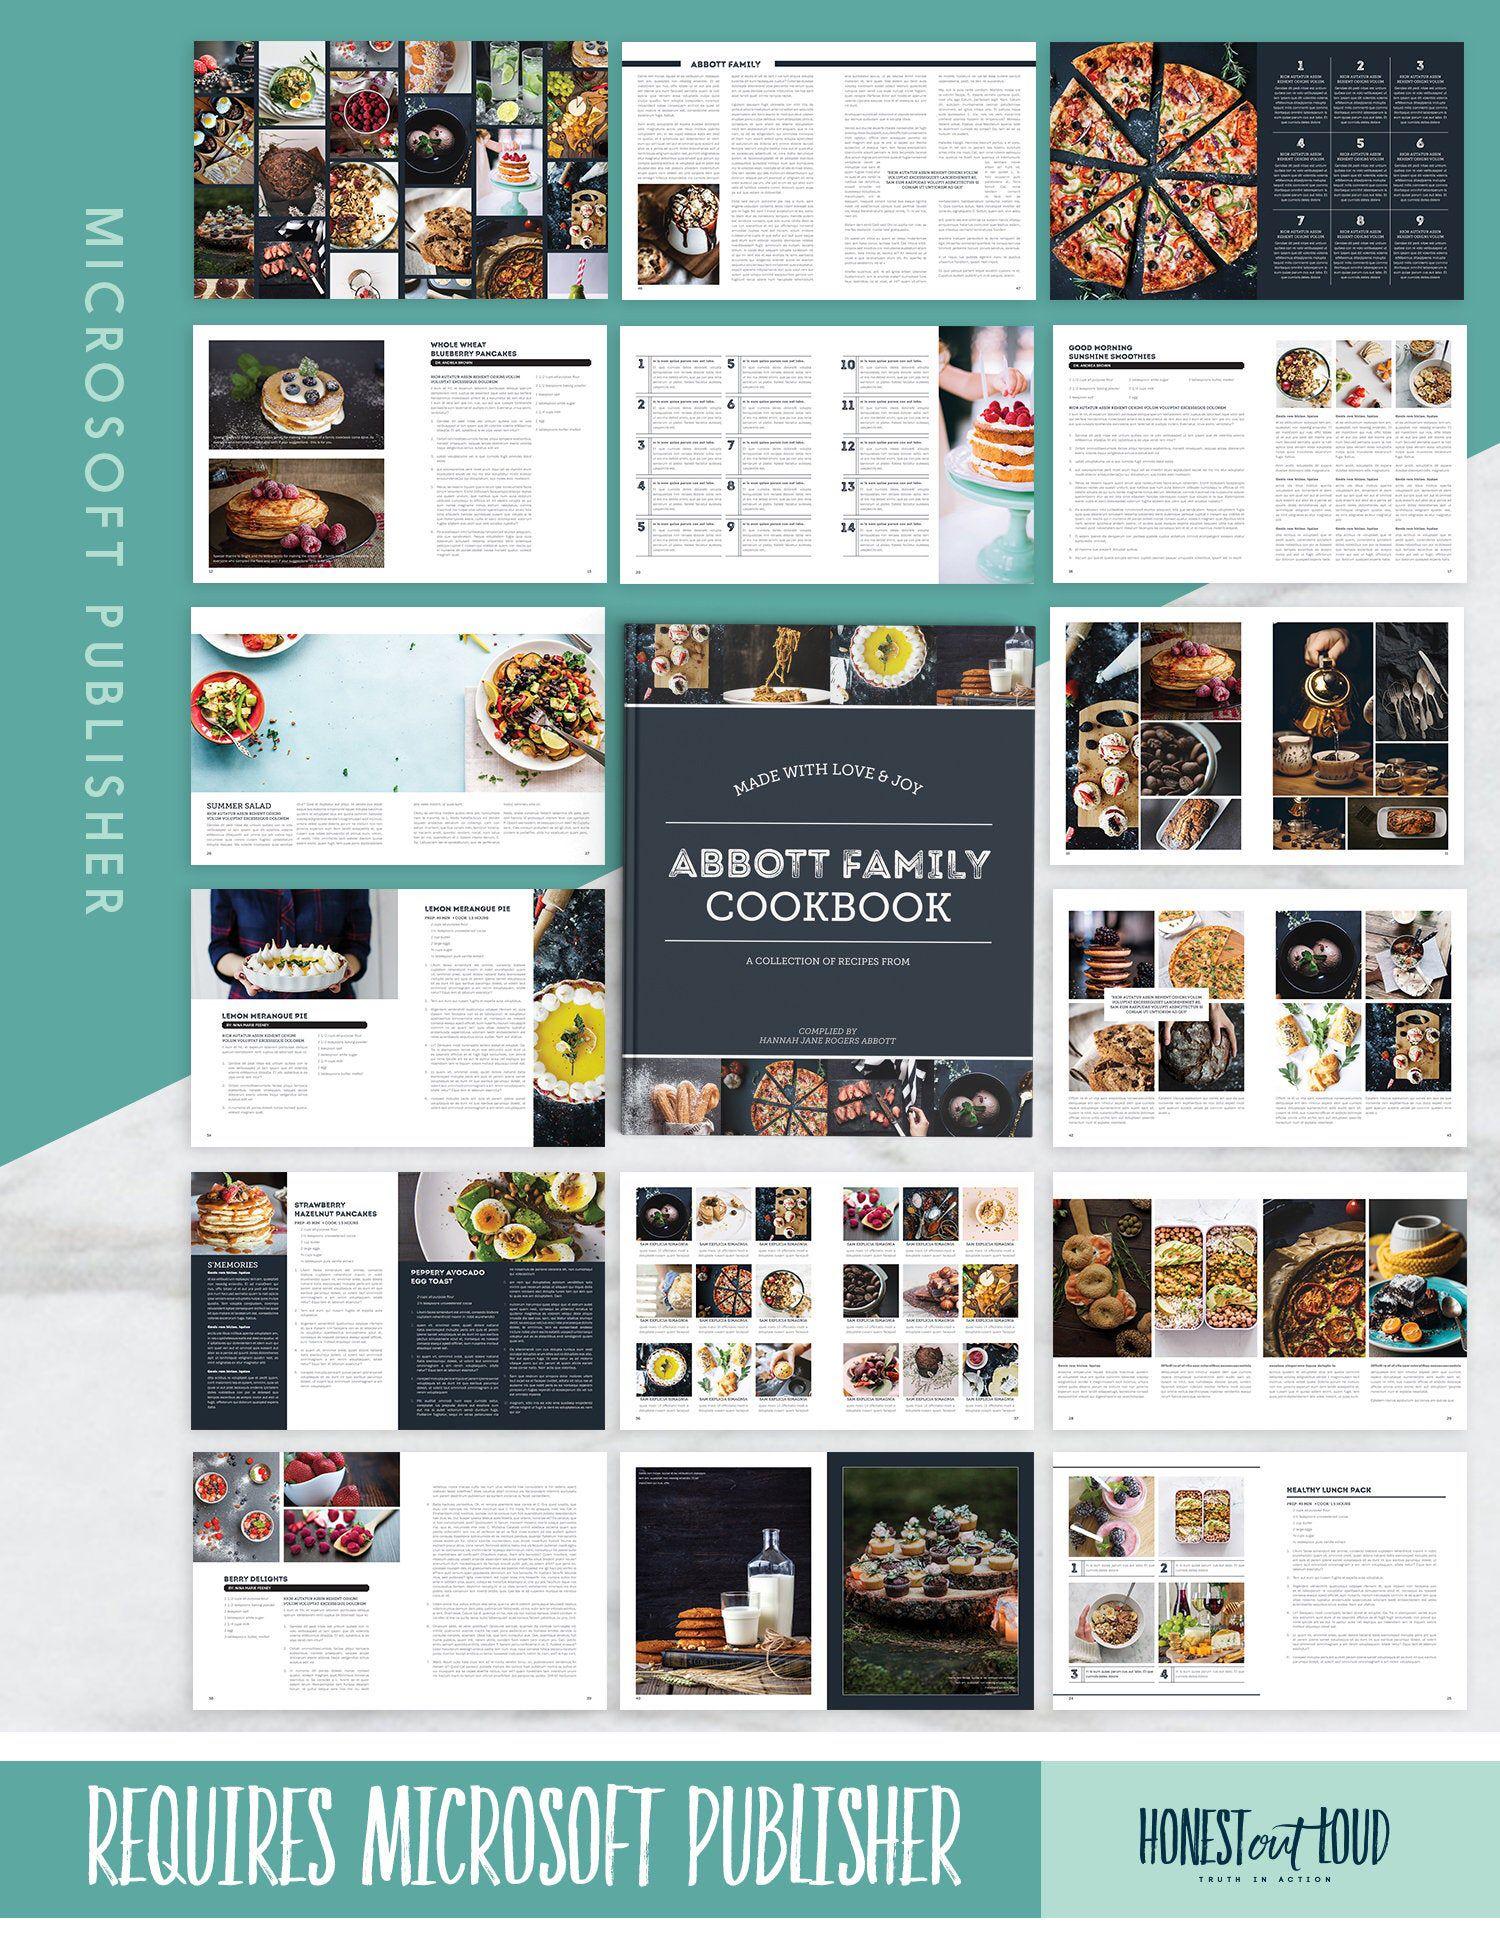 Recipe Template Cookbook Template For Microsoft Publisher Etsy Cookbook Template Recipe Template Microsoft Publisher Microsoft publisher templates free downloads